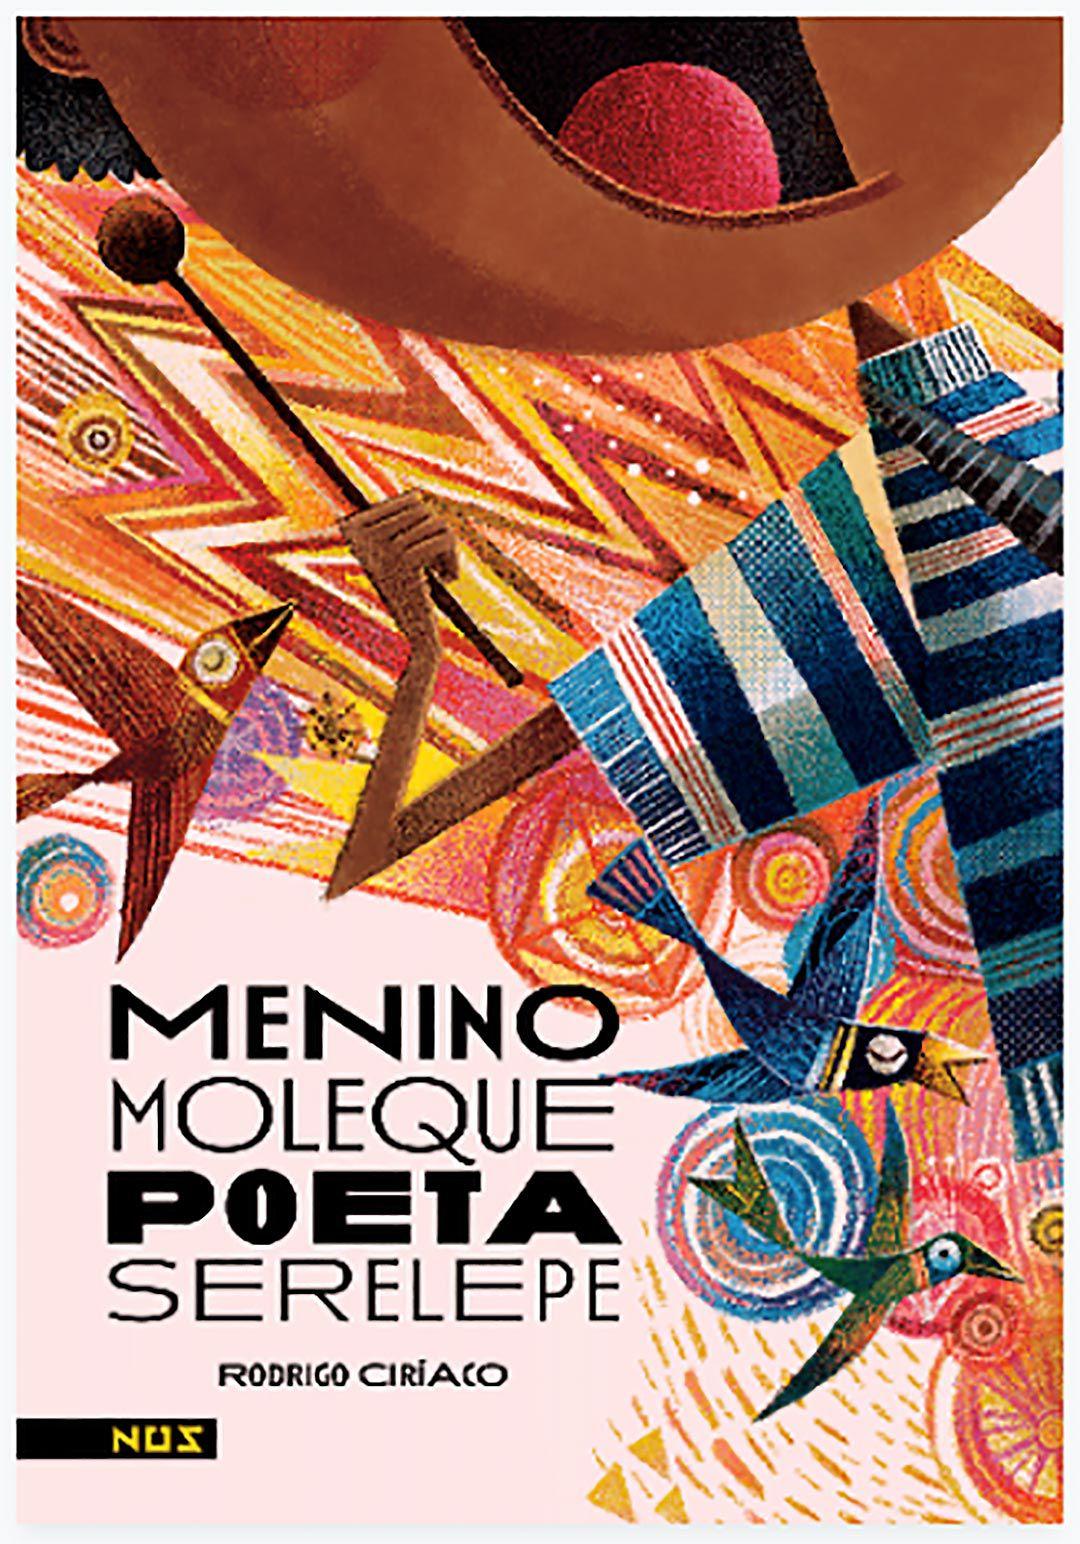 Menino Moleque Poeta Serelepe